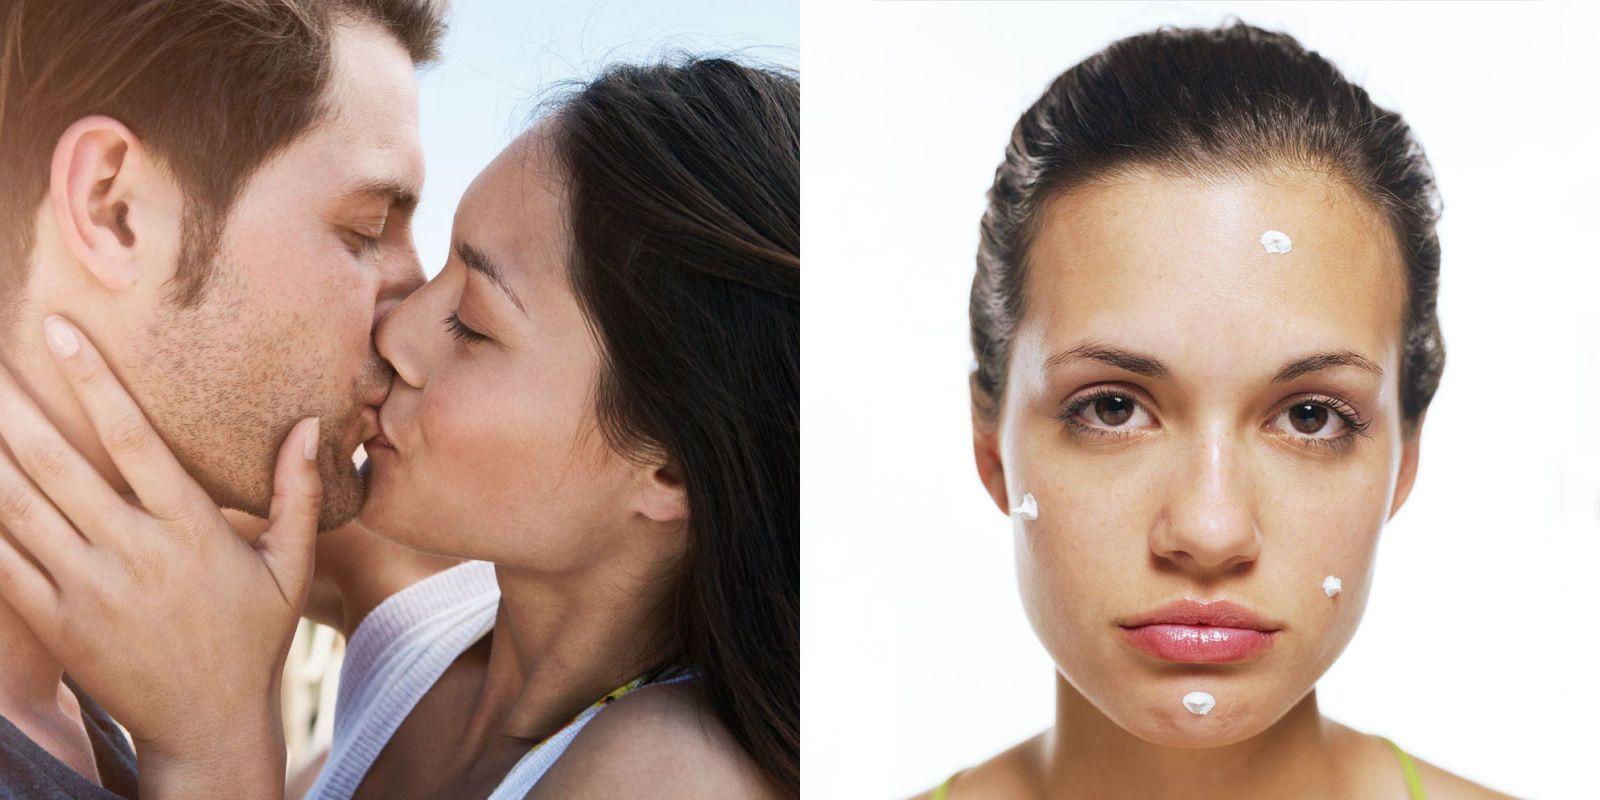 Zits pimples appear after sex